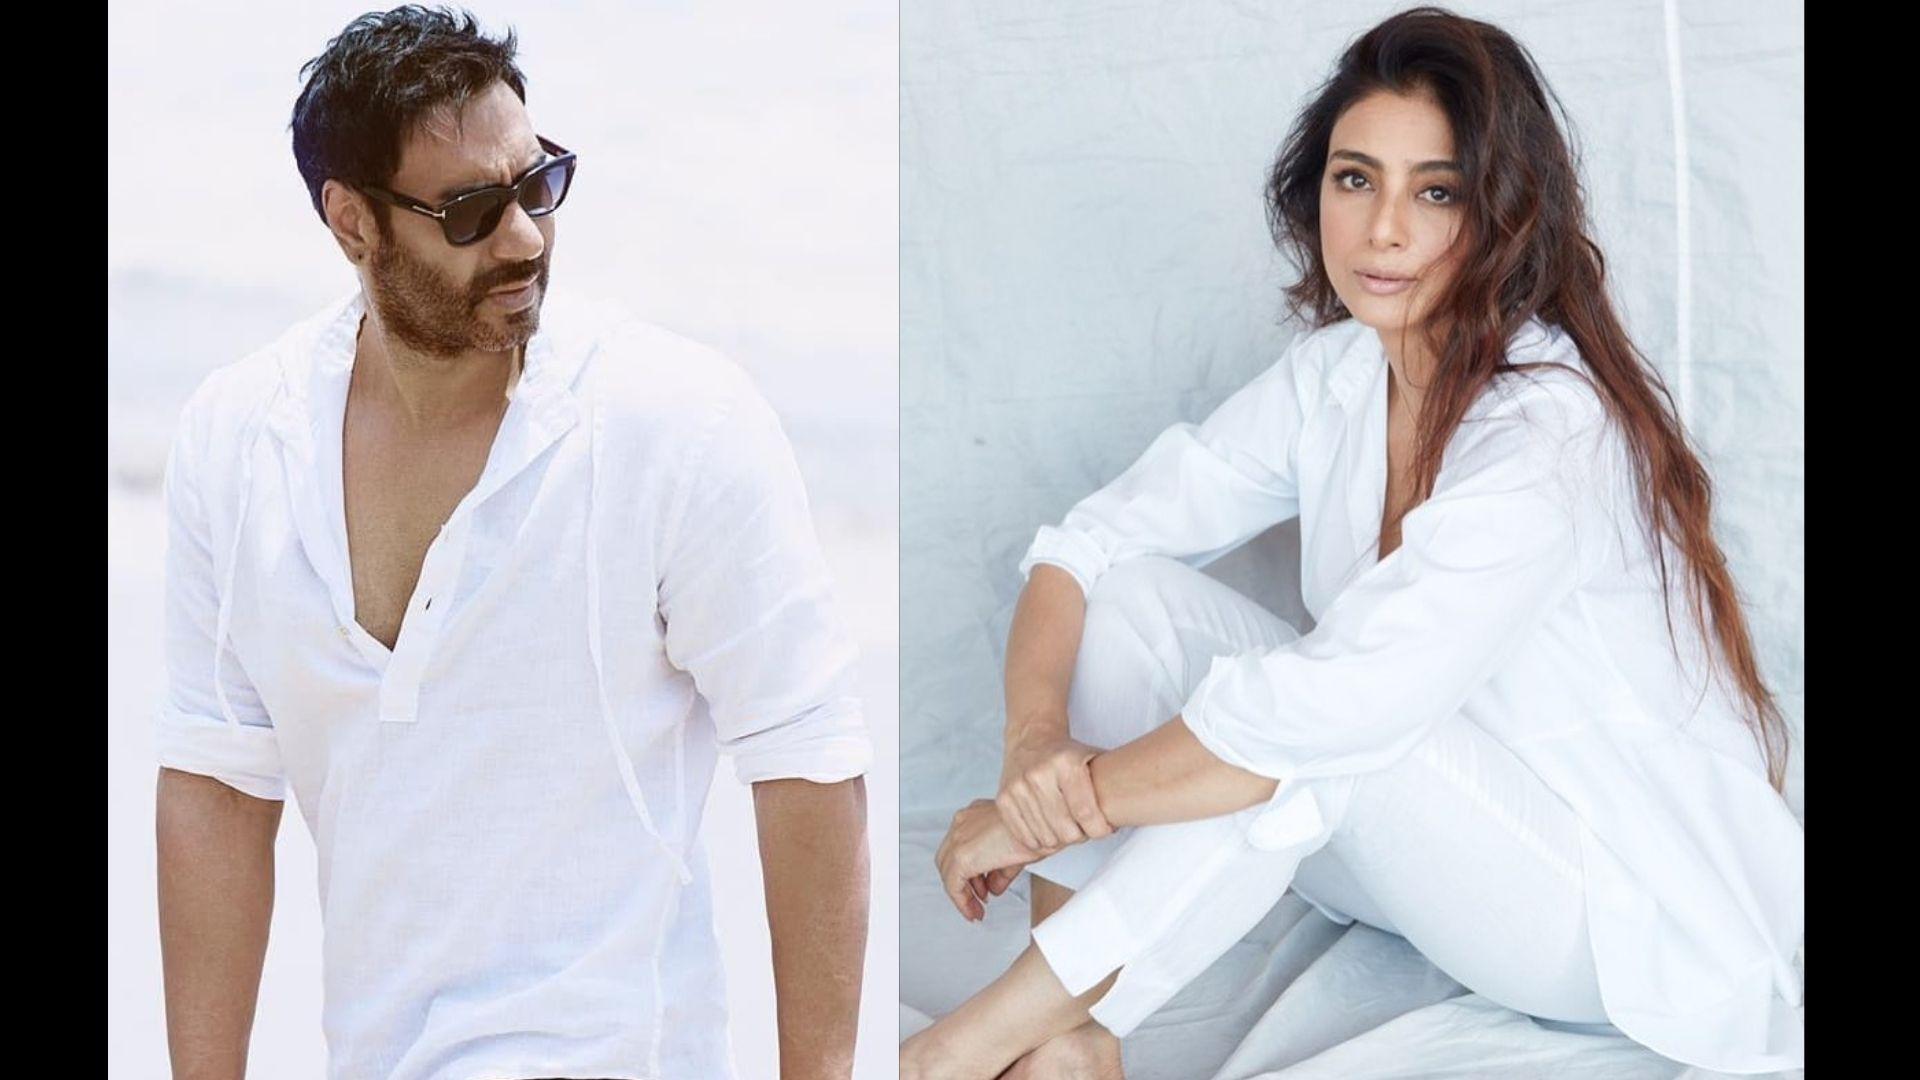 Drishyam 2: Ajay Devgn-Tabu To Reunite For Abhishek Pathak's Directorial; Film To Go On The Floors In December